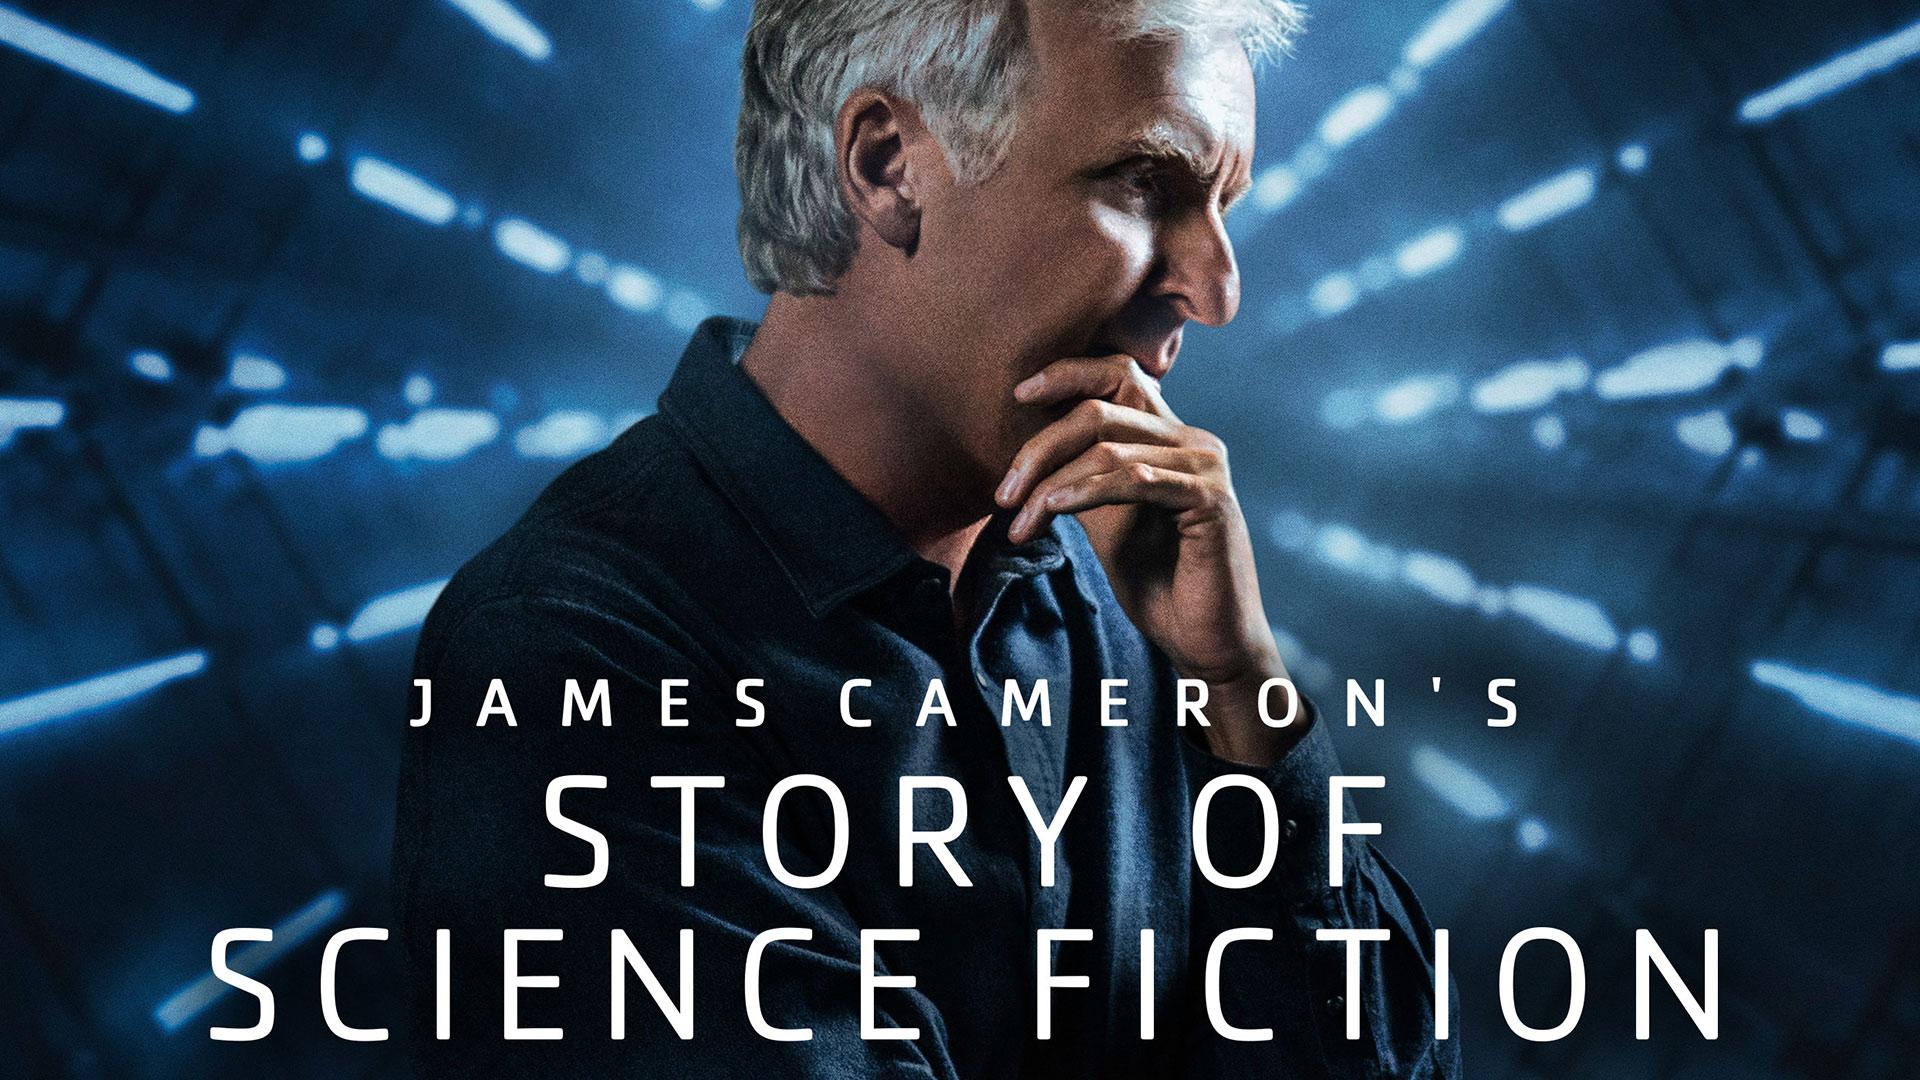 James Cameron's Story of Science Fiction Season 1